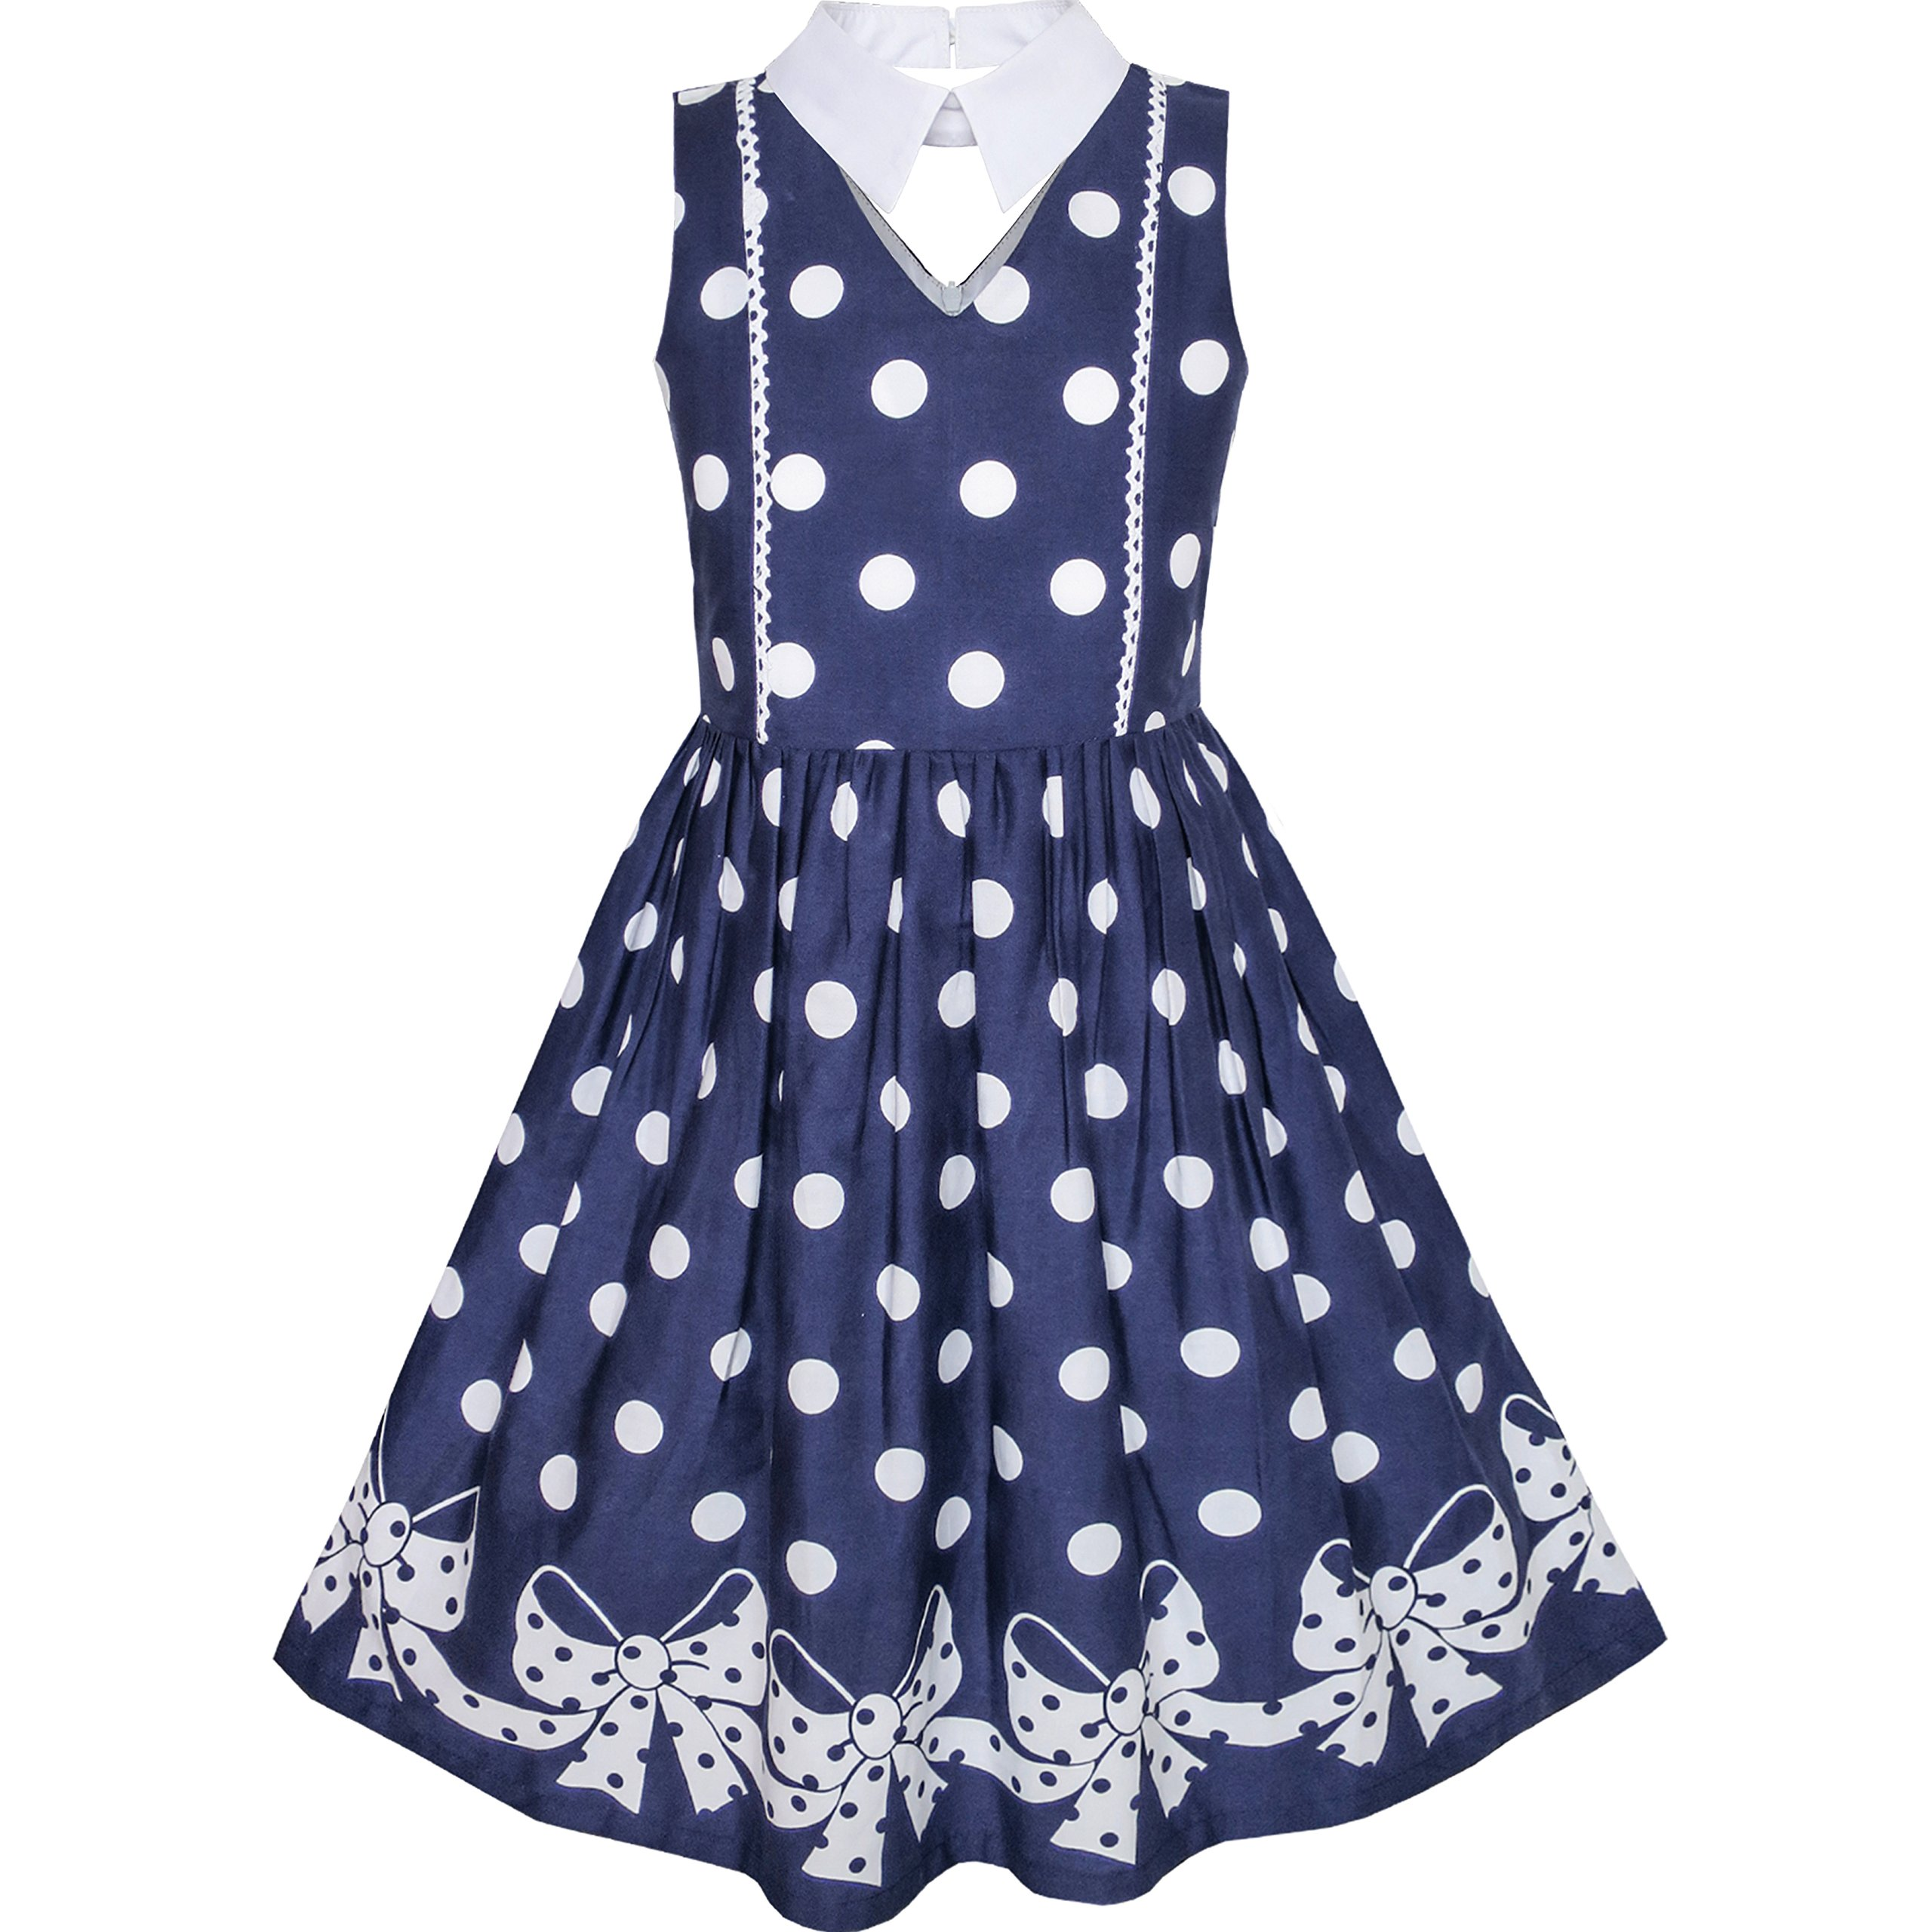 KZ85 Girls Dress Blue White Polka Dot Bow Tie Collar School Size 12